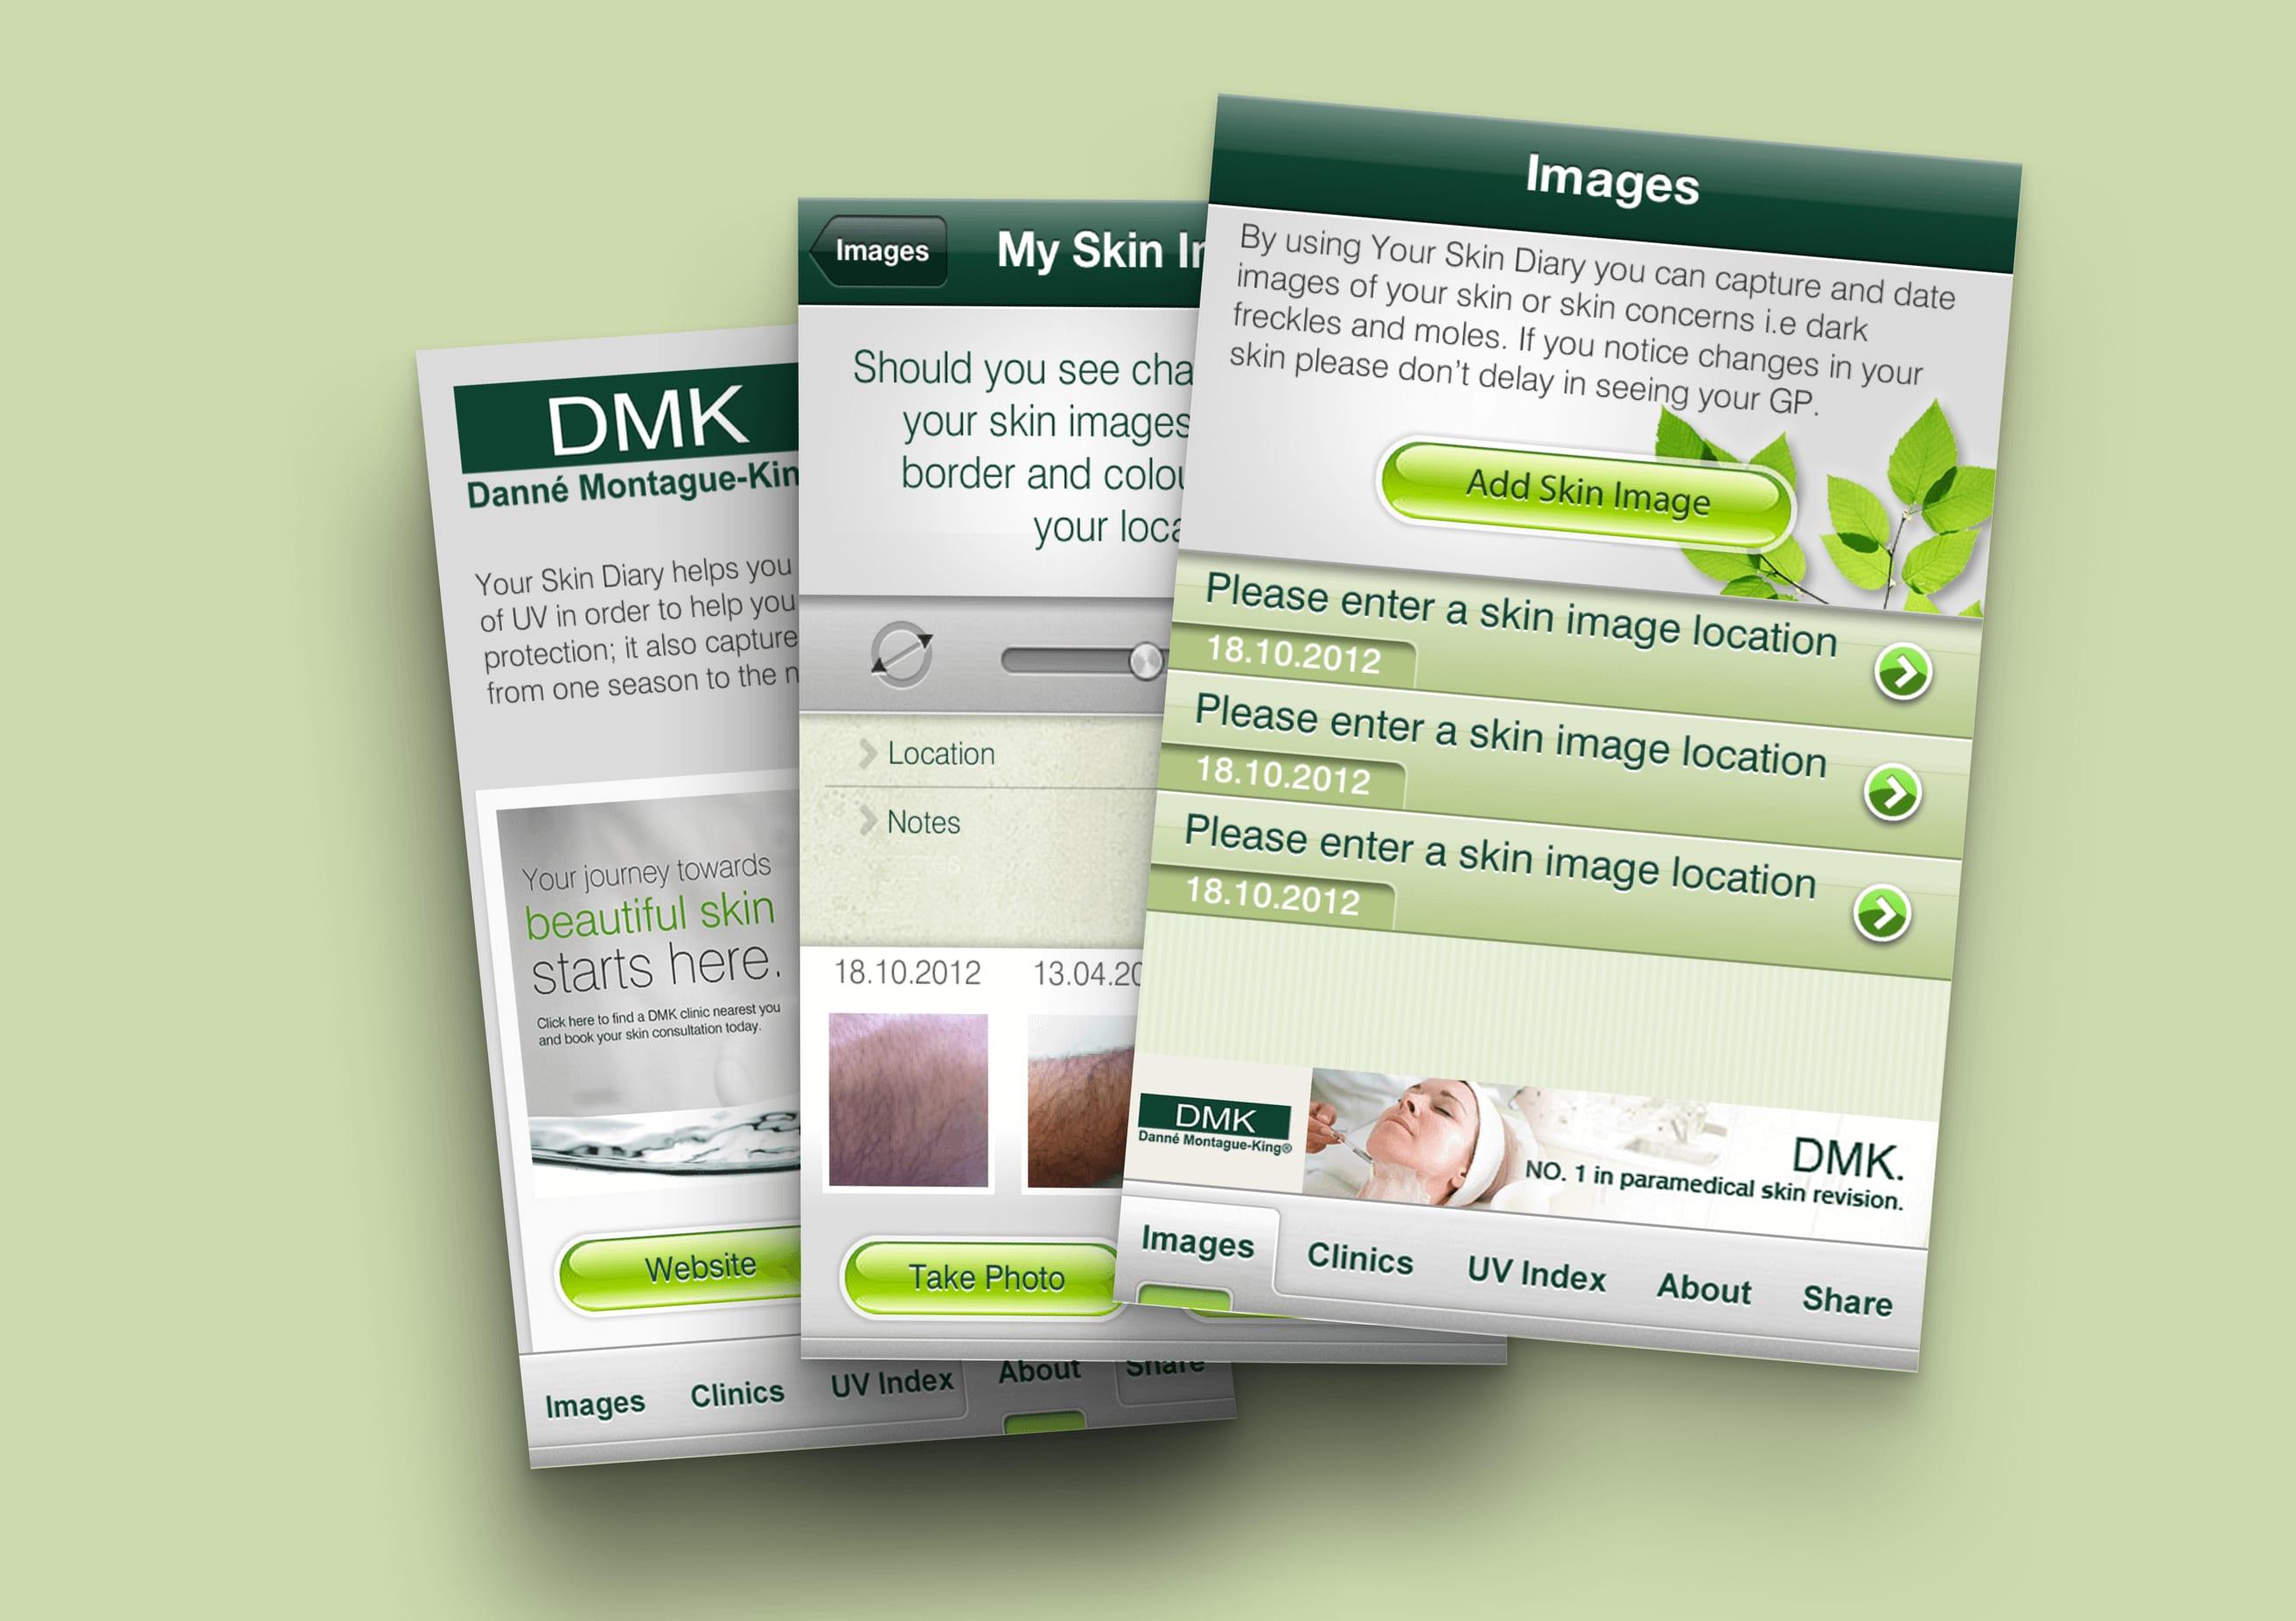 DMK-001@3x-mobile